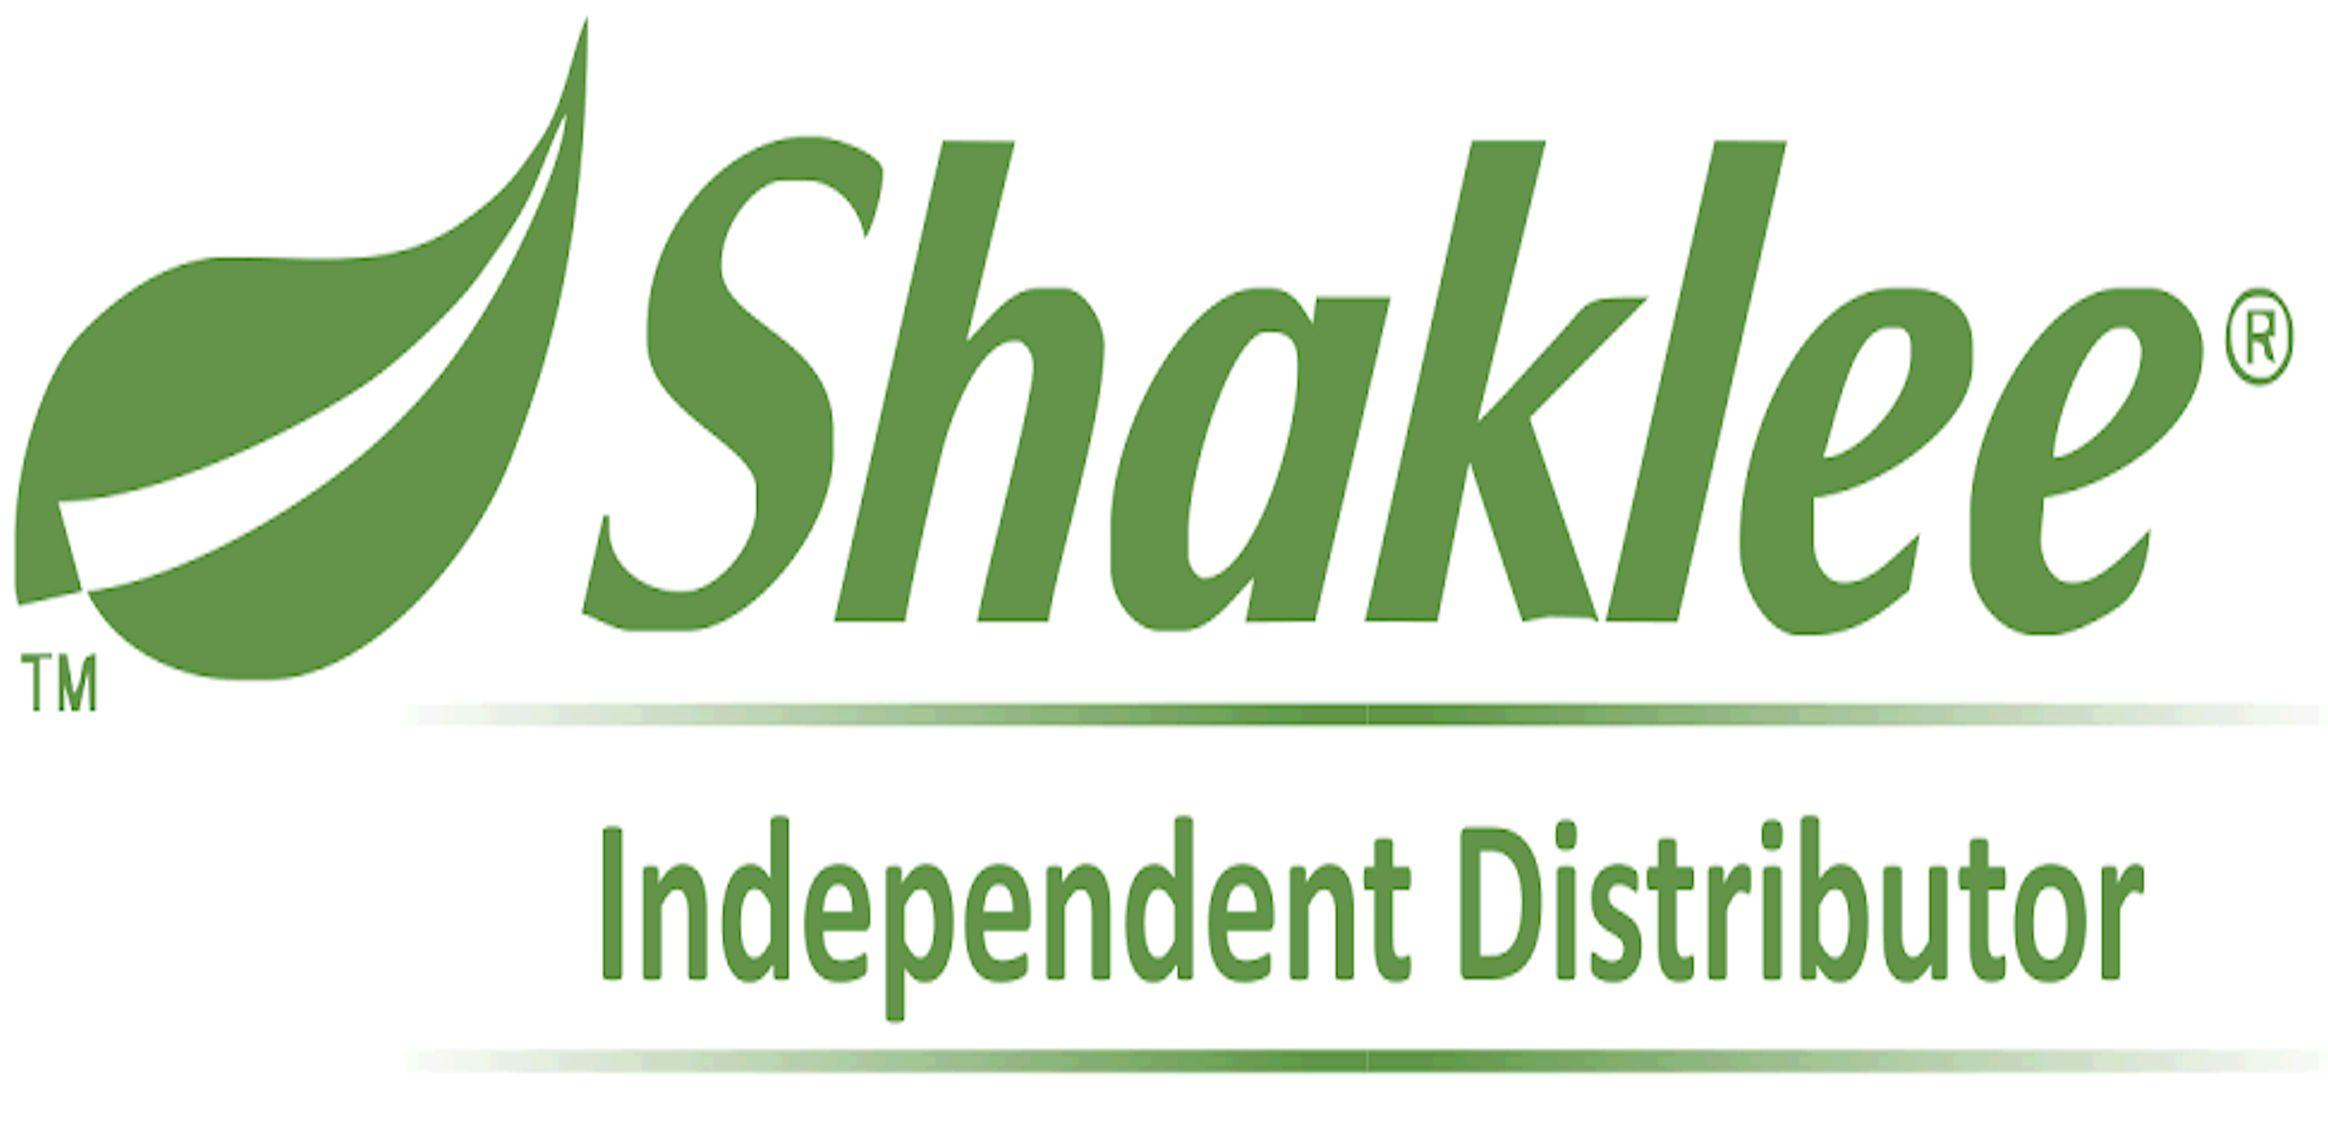 shaklee_logo._2328x1144.jpg